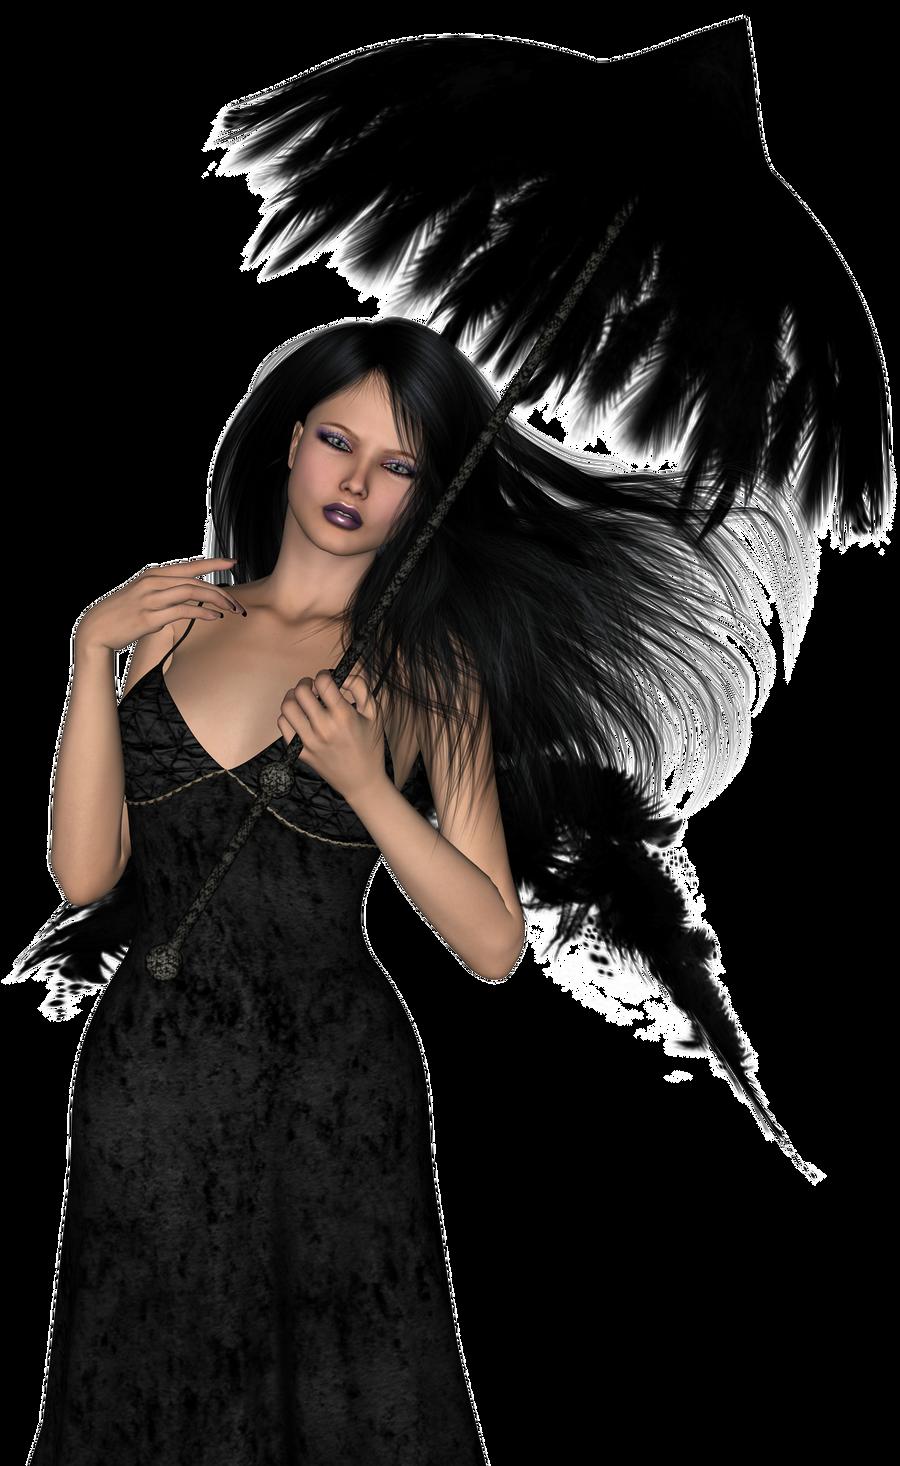 dark angel stock 002 by Ecathe